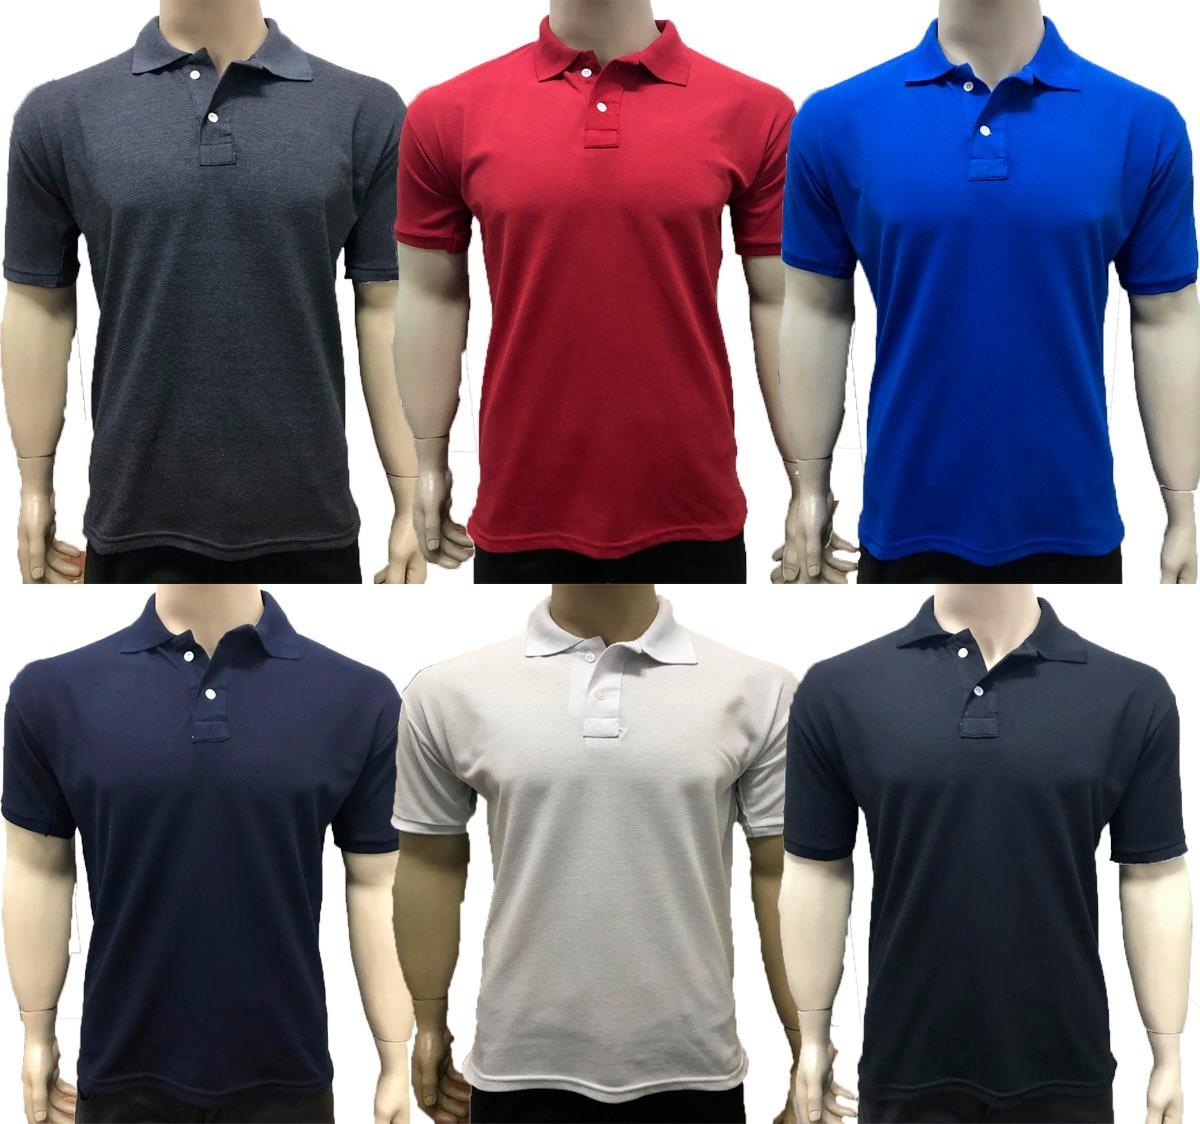 kit 6 camisas gola polo básica equilíbrio uniforme atacado. Carregando zoom. ea0595f5a9dbd